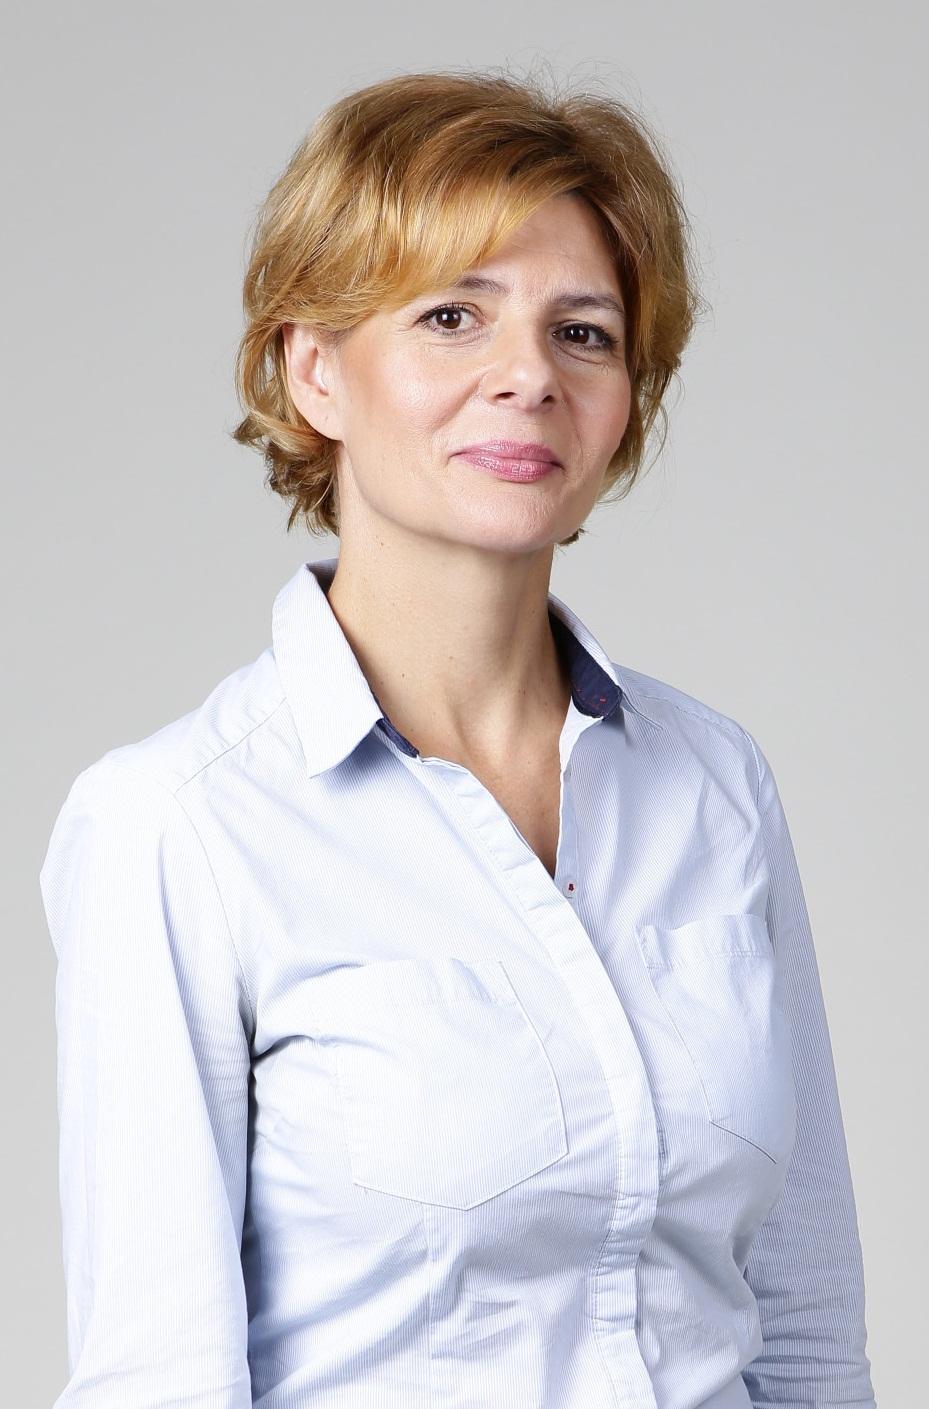 Izabella Górzyńska